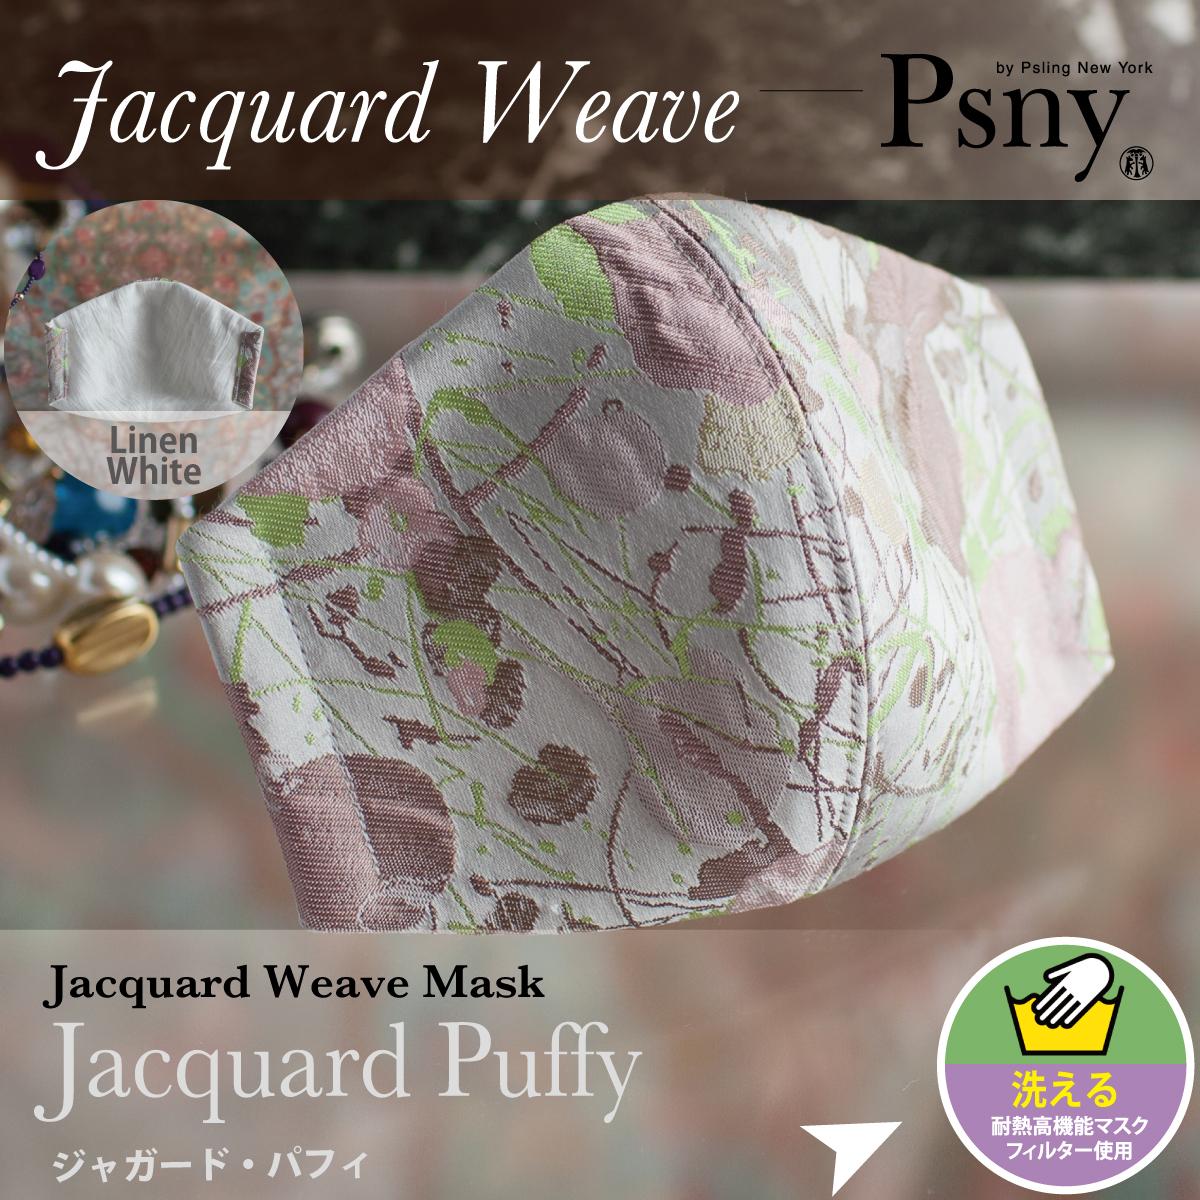 PSNY ジャガード パフィー 花粉 黄砂 洗えるフィルター入り 立体 マスク 大人用 送料無料